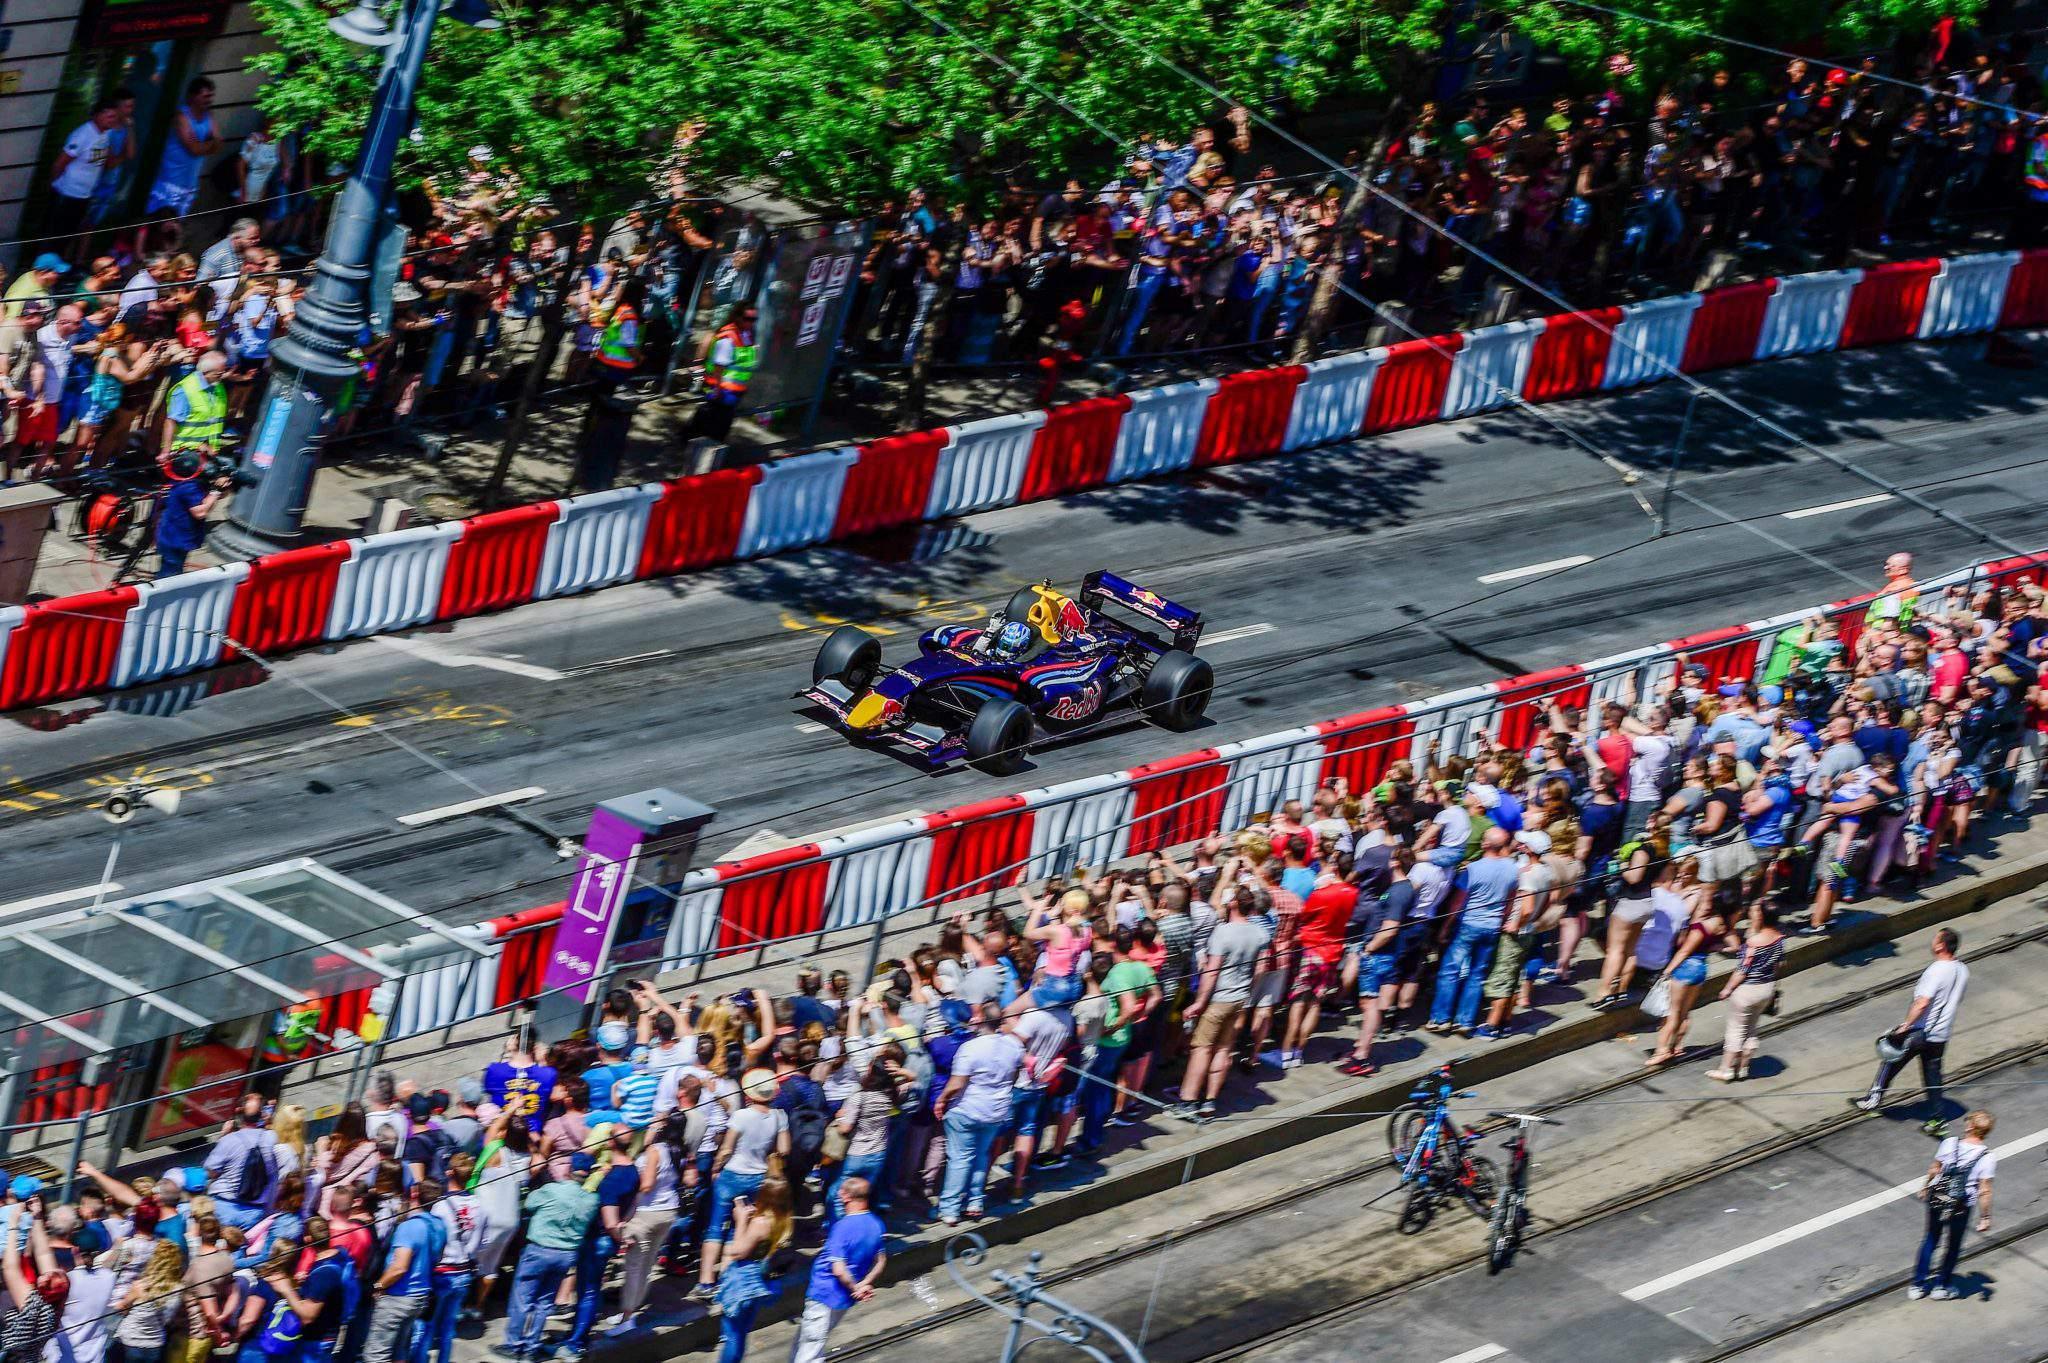 Great Race car motor show